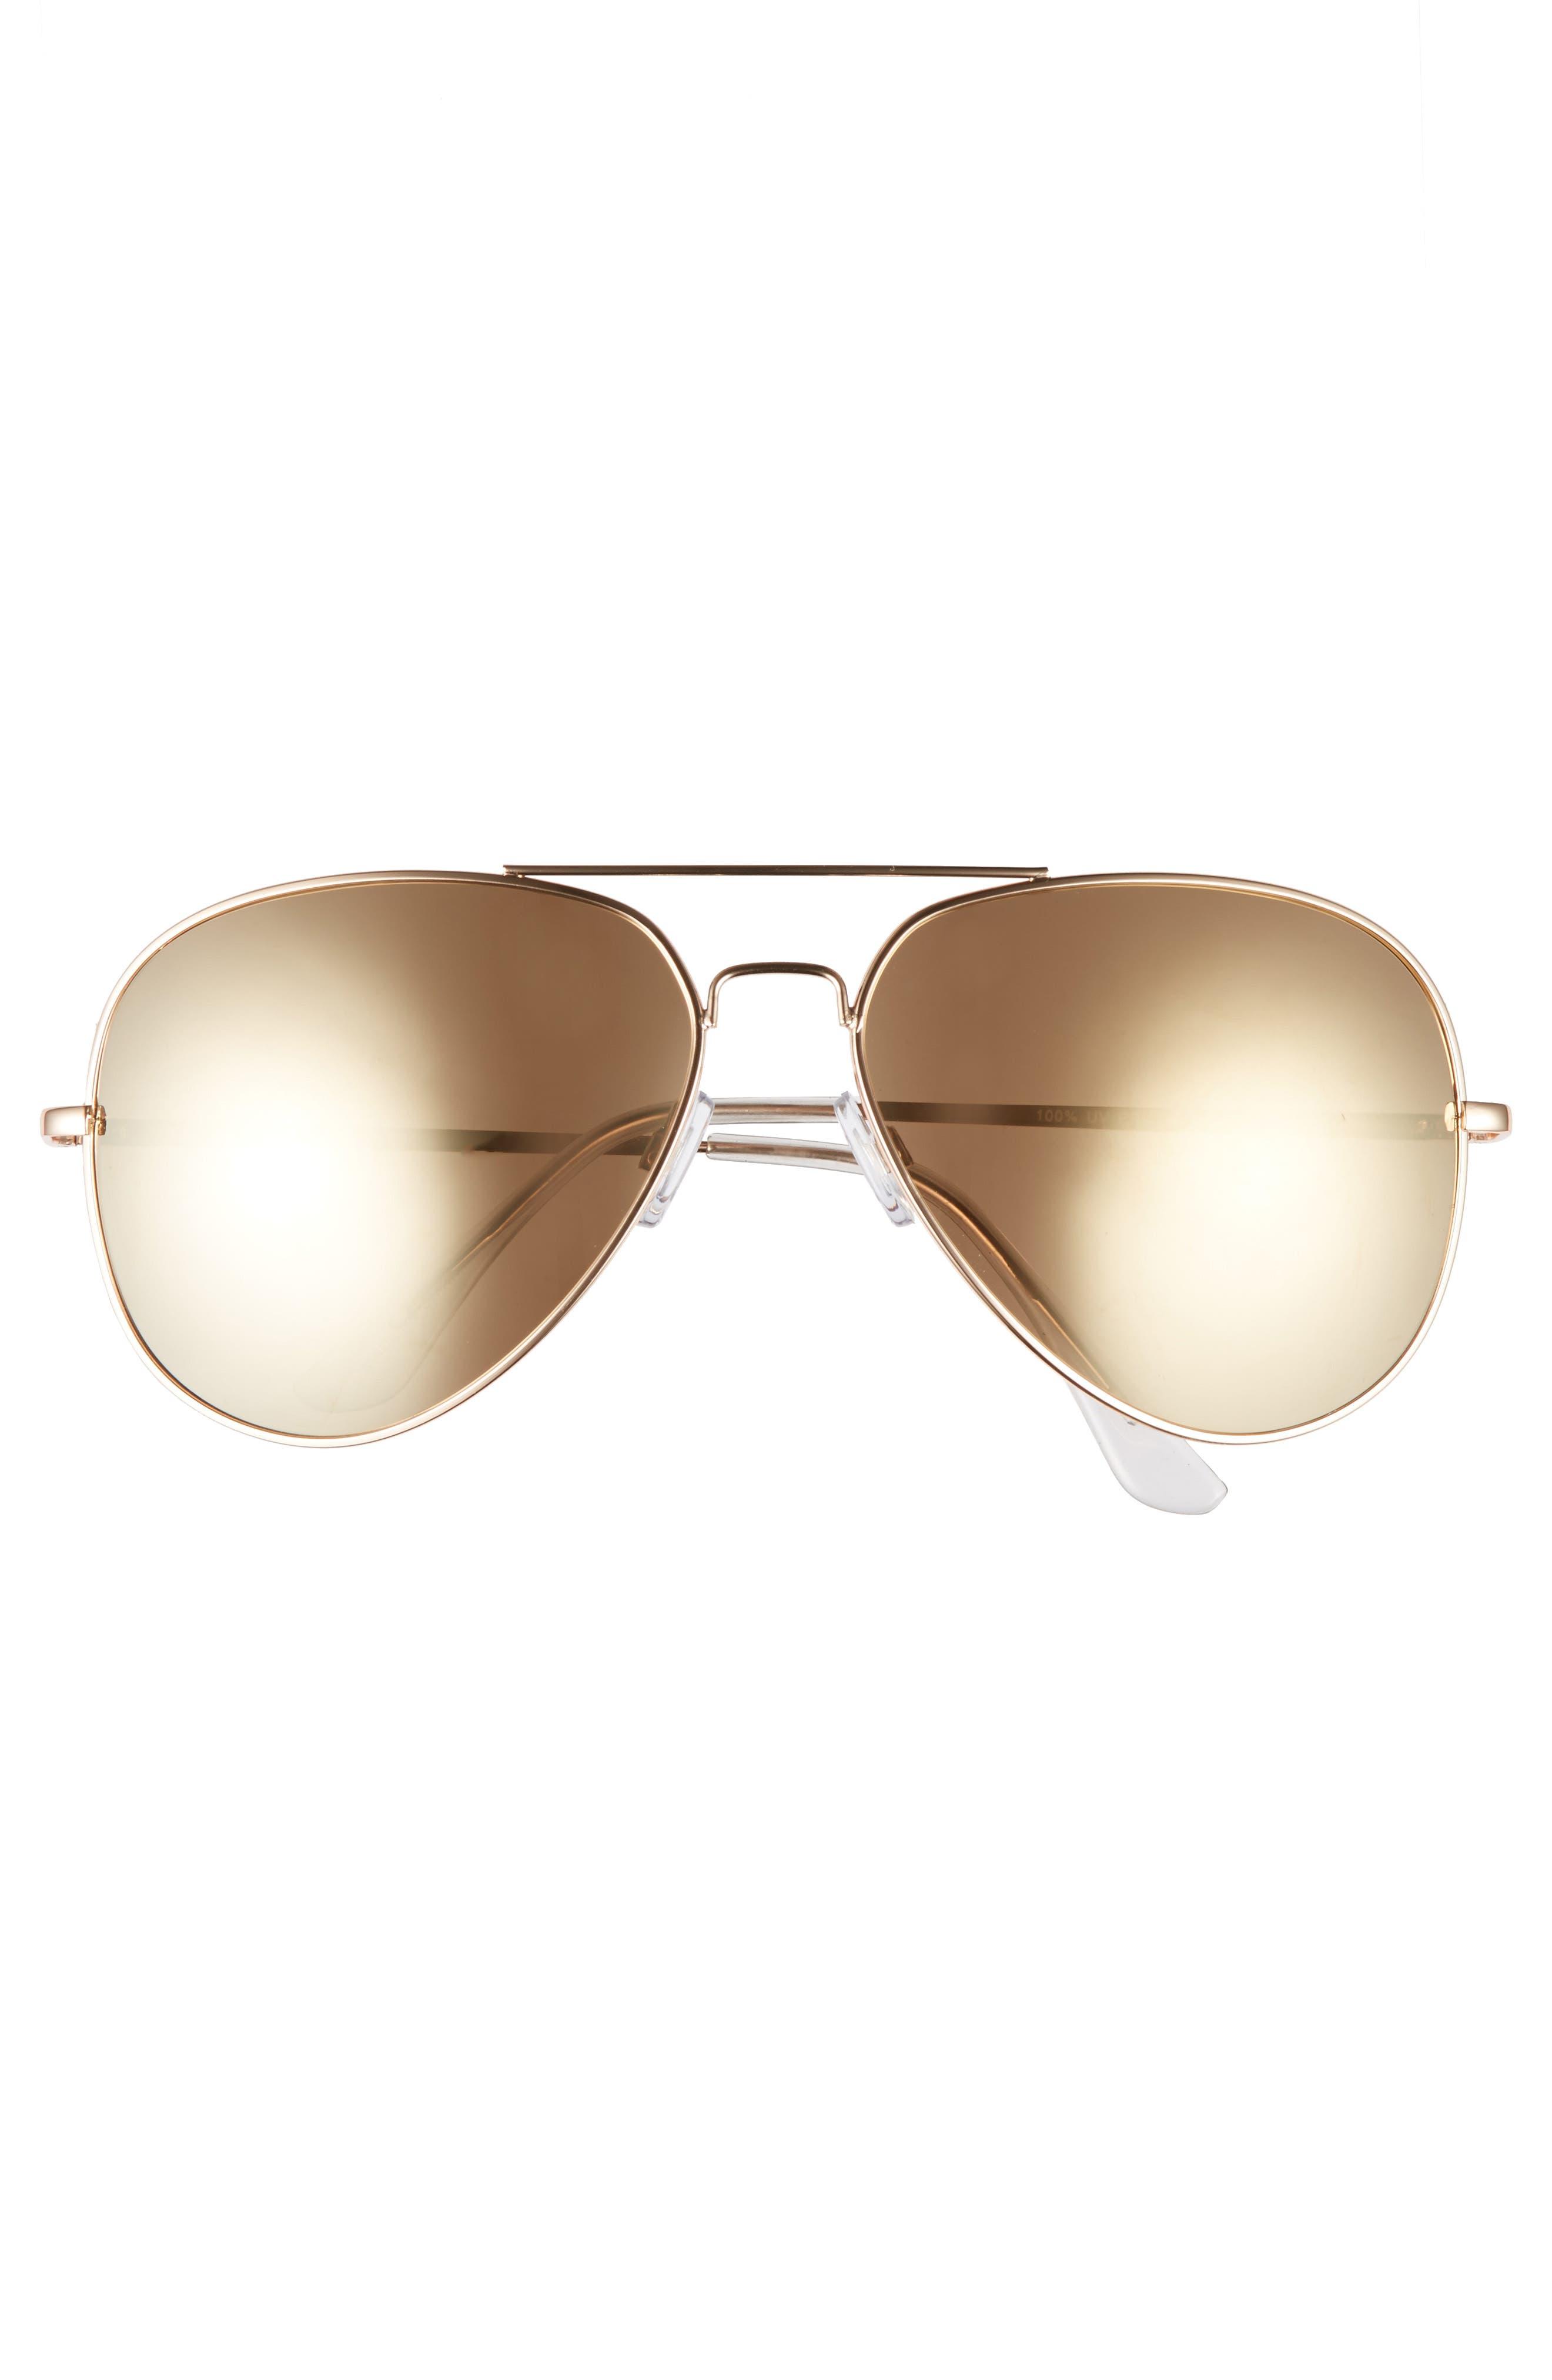 60mm Large Aviator Sunglasses,                             Alternate thumbnail 6, color,